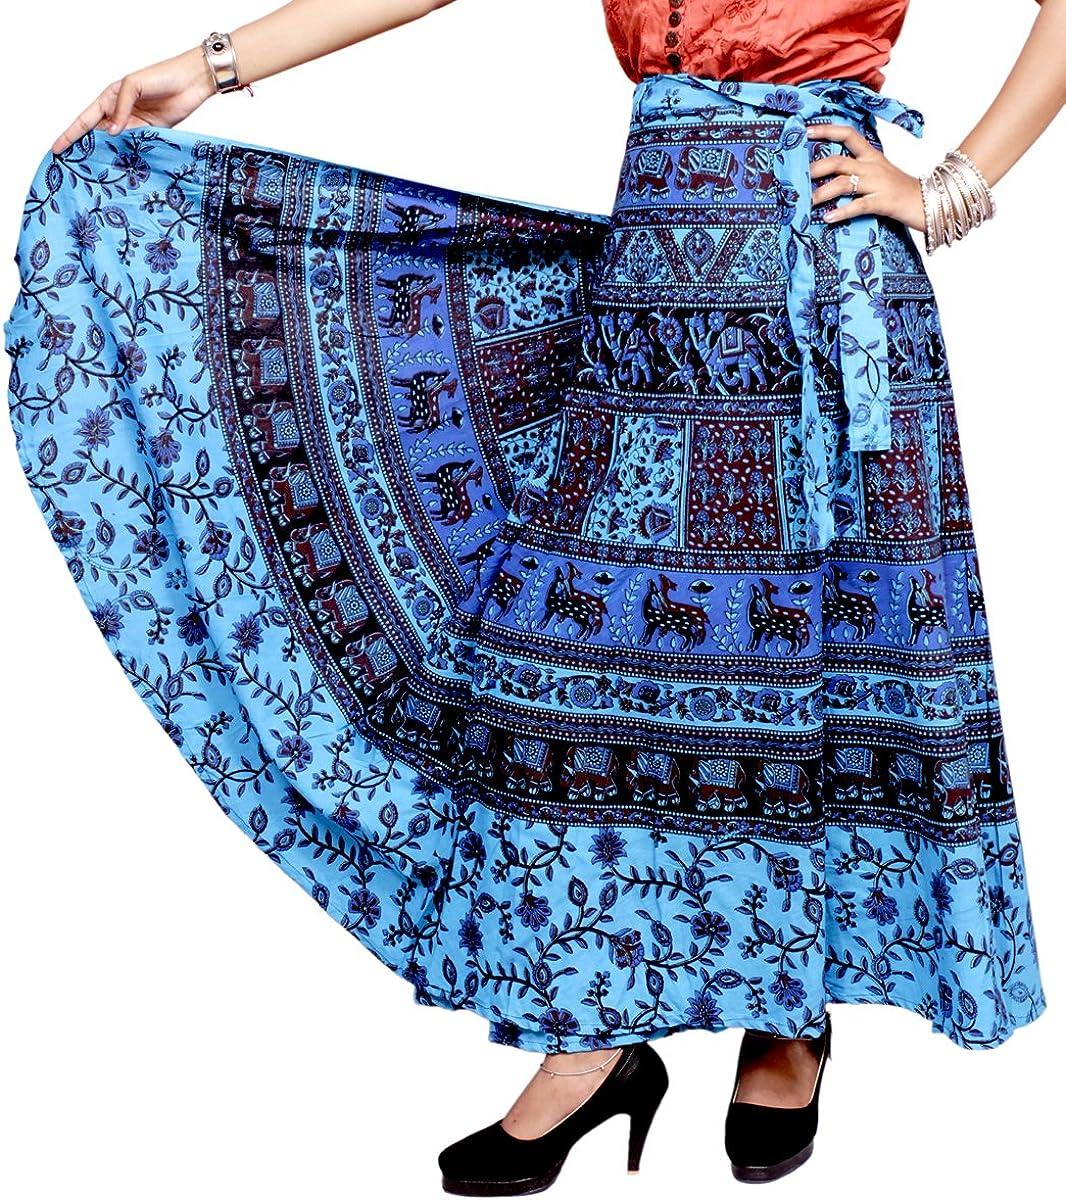 Falda larga circular impresiones estilo Ethnic, Hippie, Boho ...